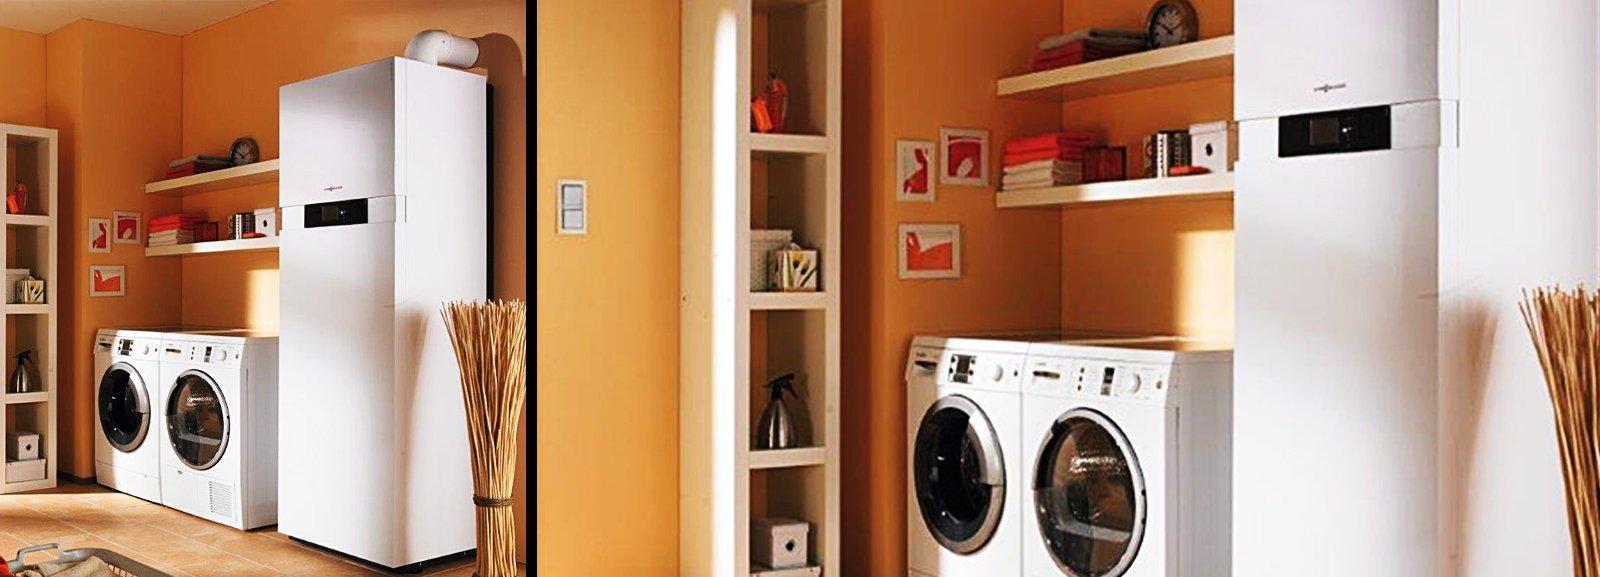 Cambiare la caldaia cose di casa for Viessmann caldaie